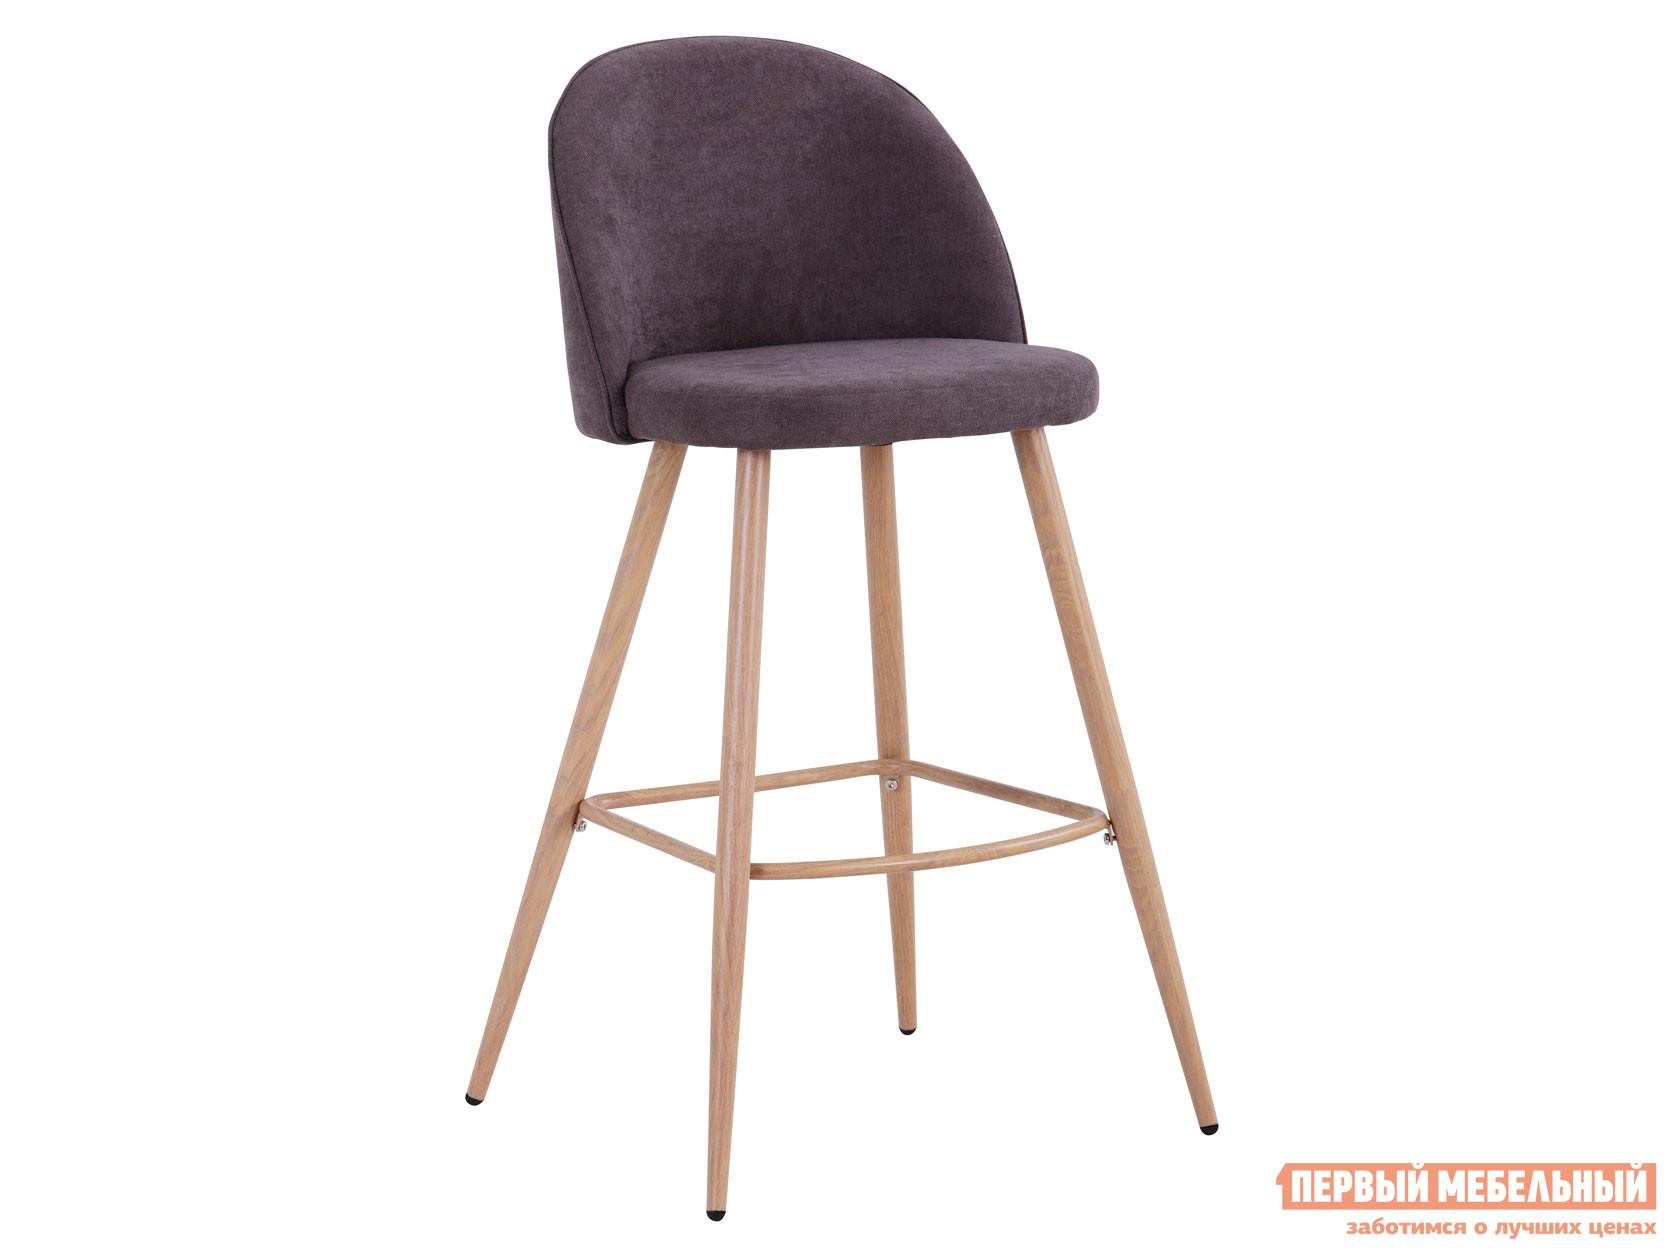 Барный стул  Лион BC-99004 Темно-серый, шенилл / Светлое дерево Stool Group 116267